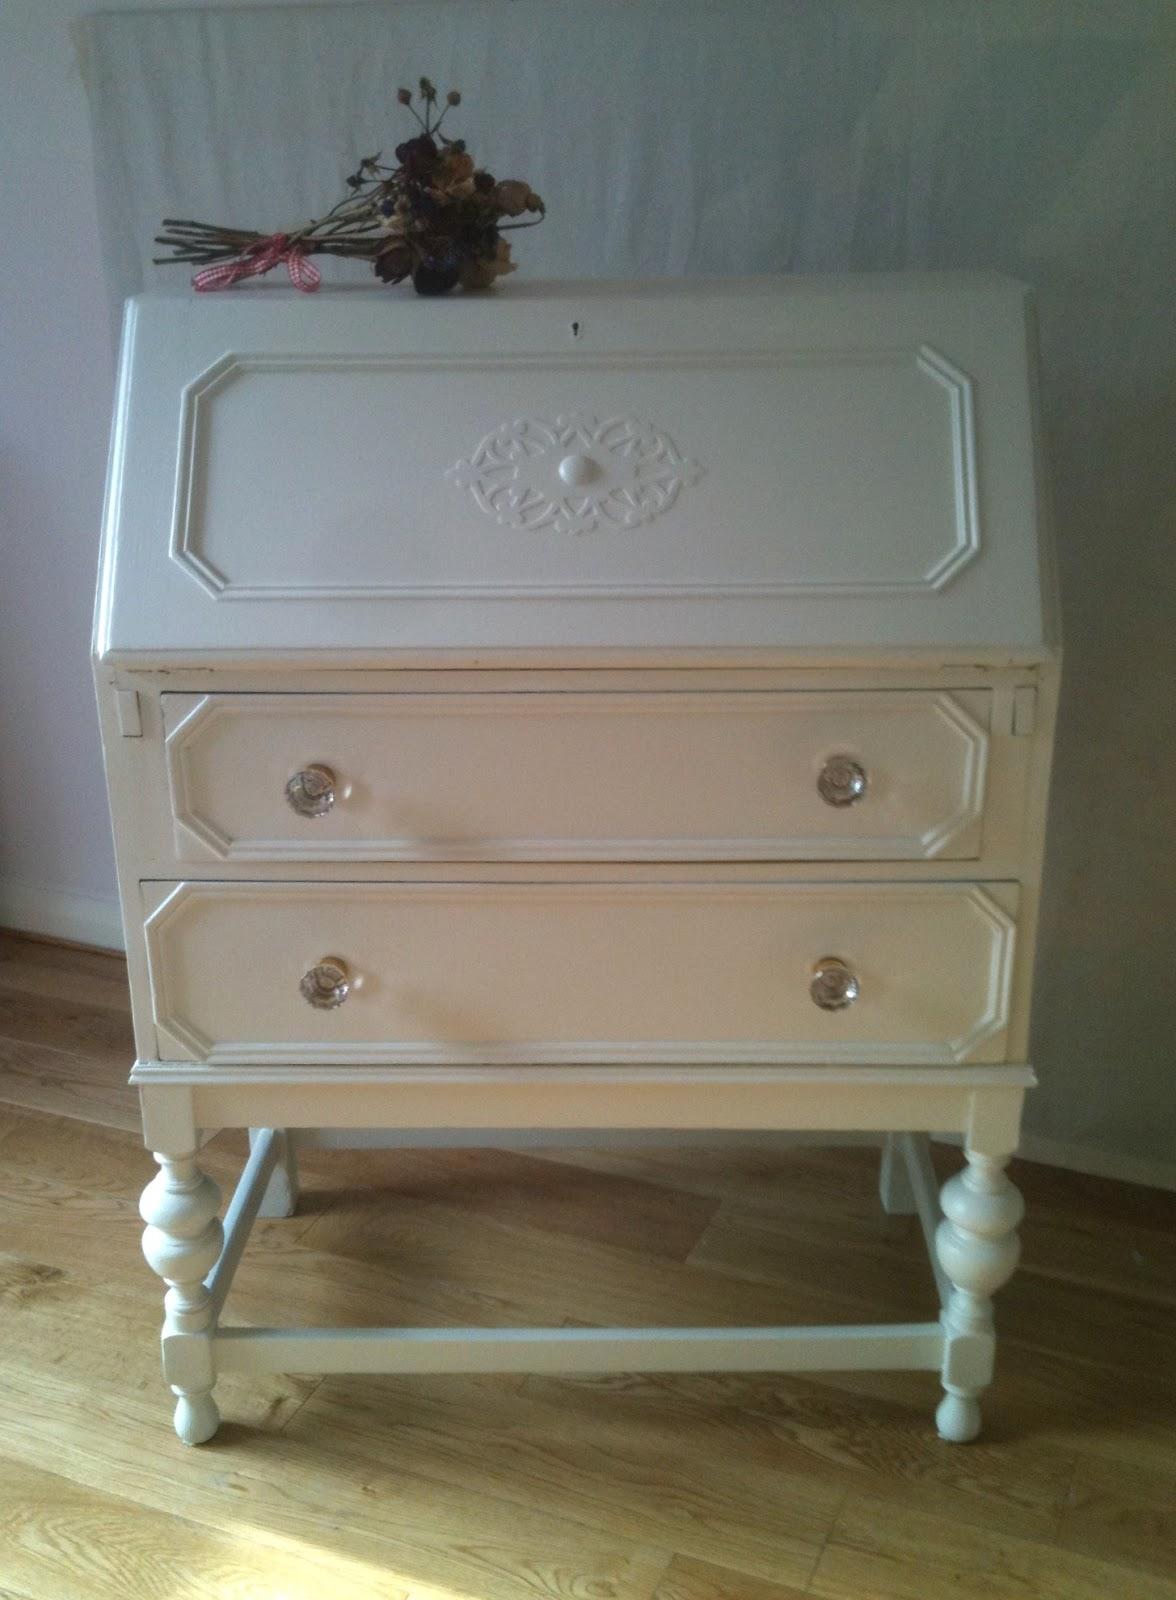 Vintage Antique White Drawer Pulls